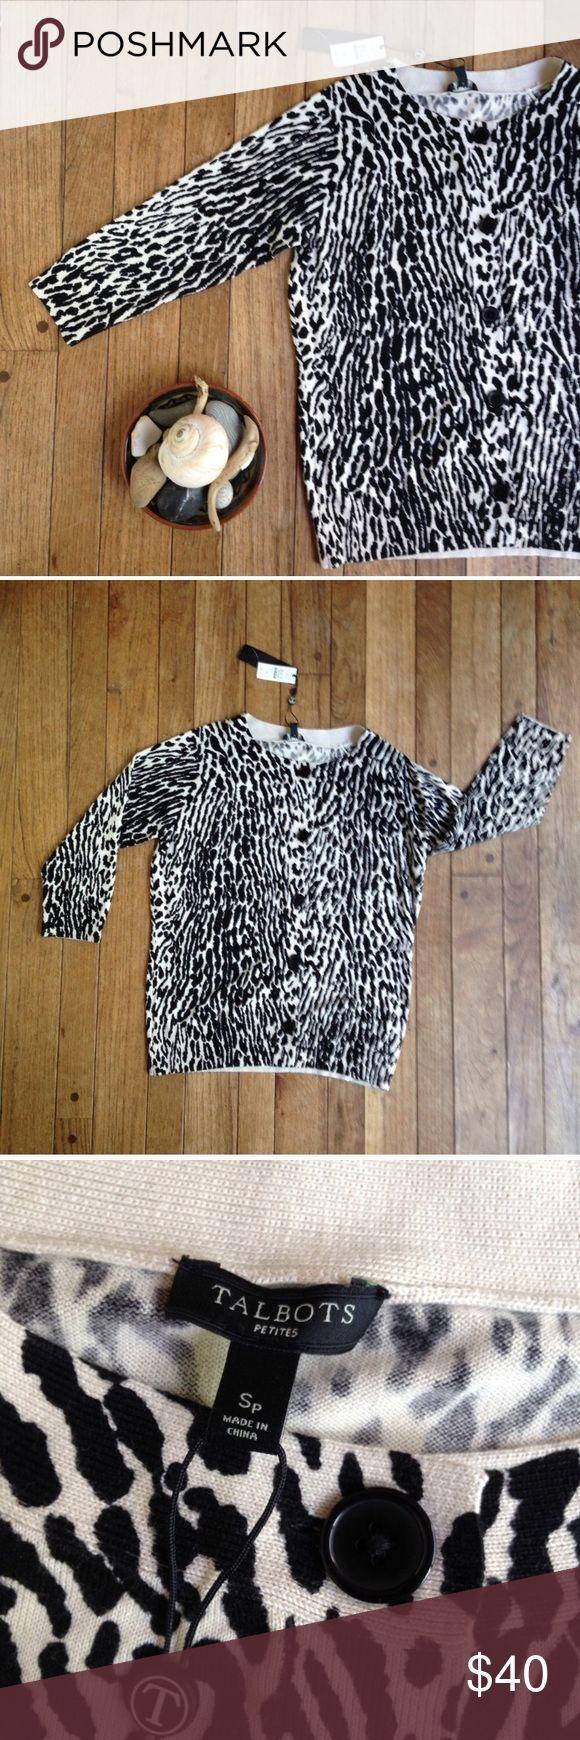 *NWT Talbots Petite animal print cardigan * NWT. Black & cream animal print. 3/4 sleeve. Cotton/rayon blend. Measurements tonight. Talbots Sweaters Cardigans